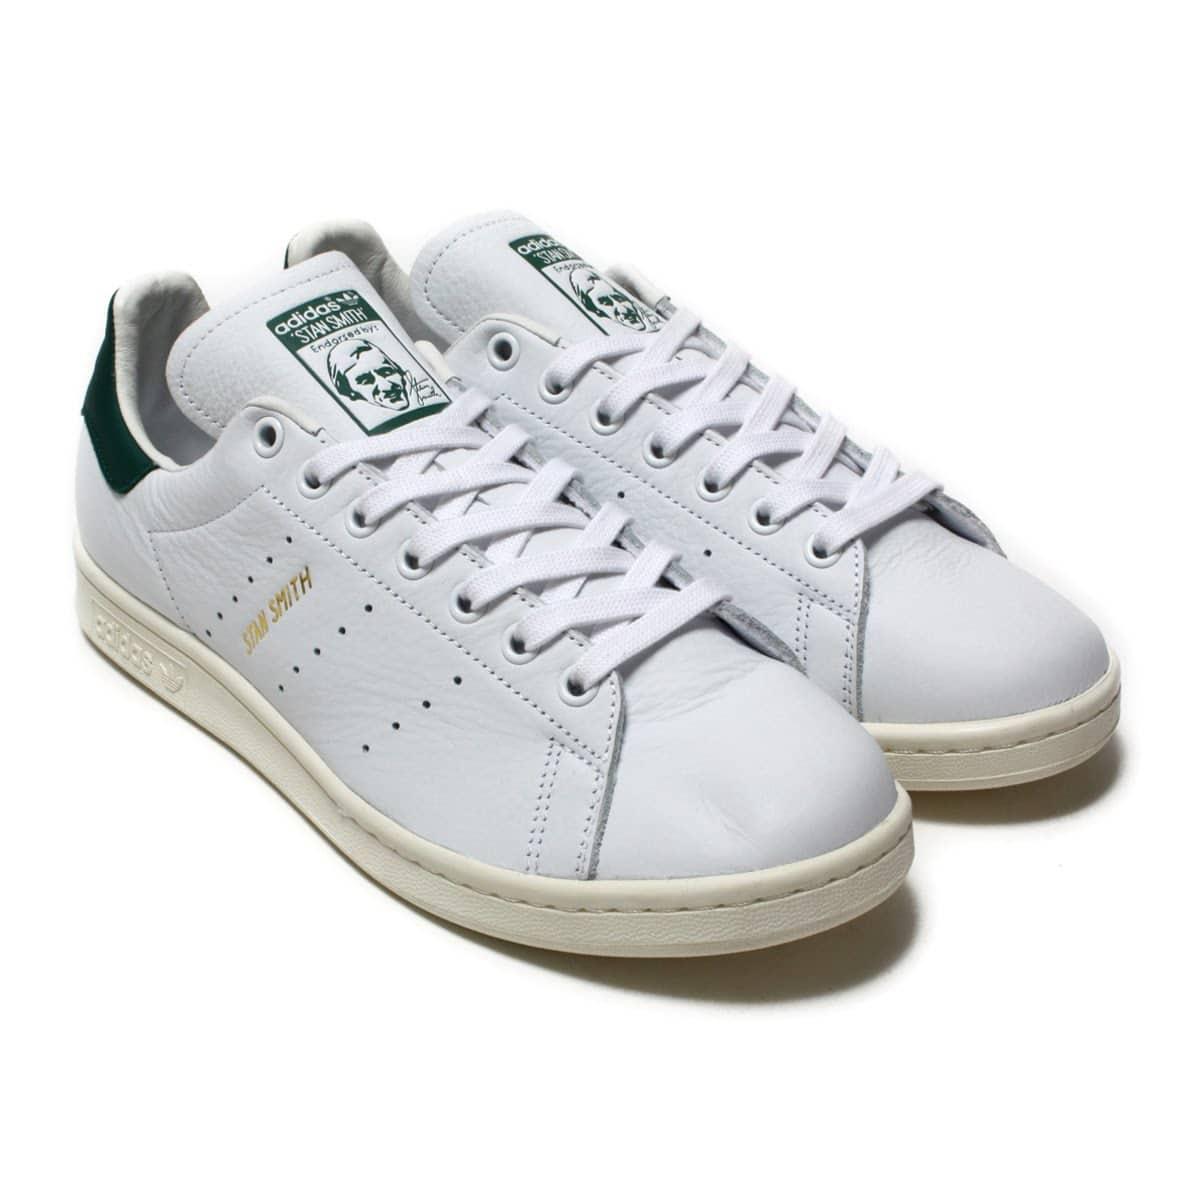 adidas Originals STAN SMITH Running White/Running White/Collegiate Green 20SS-I_photo_large